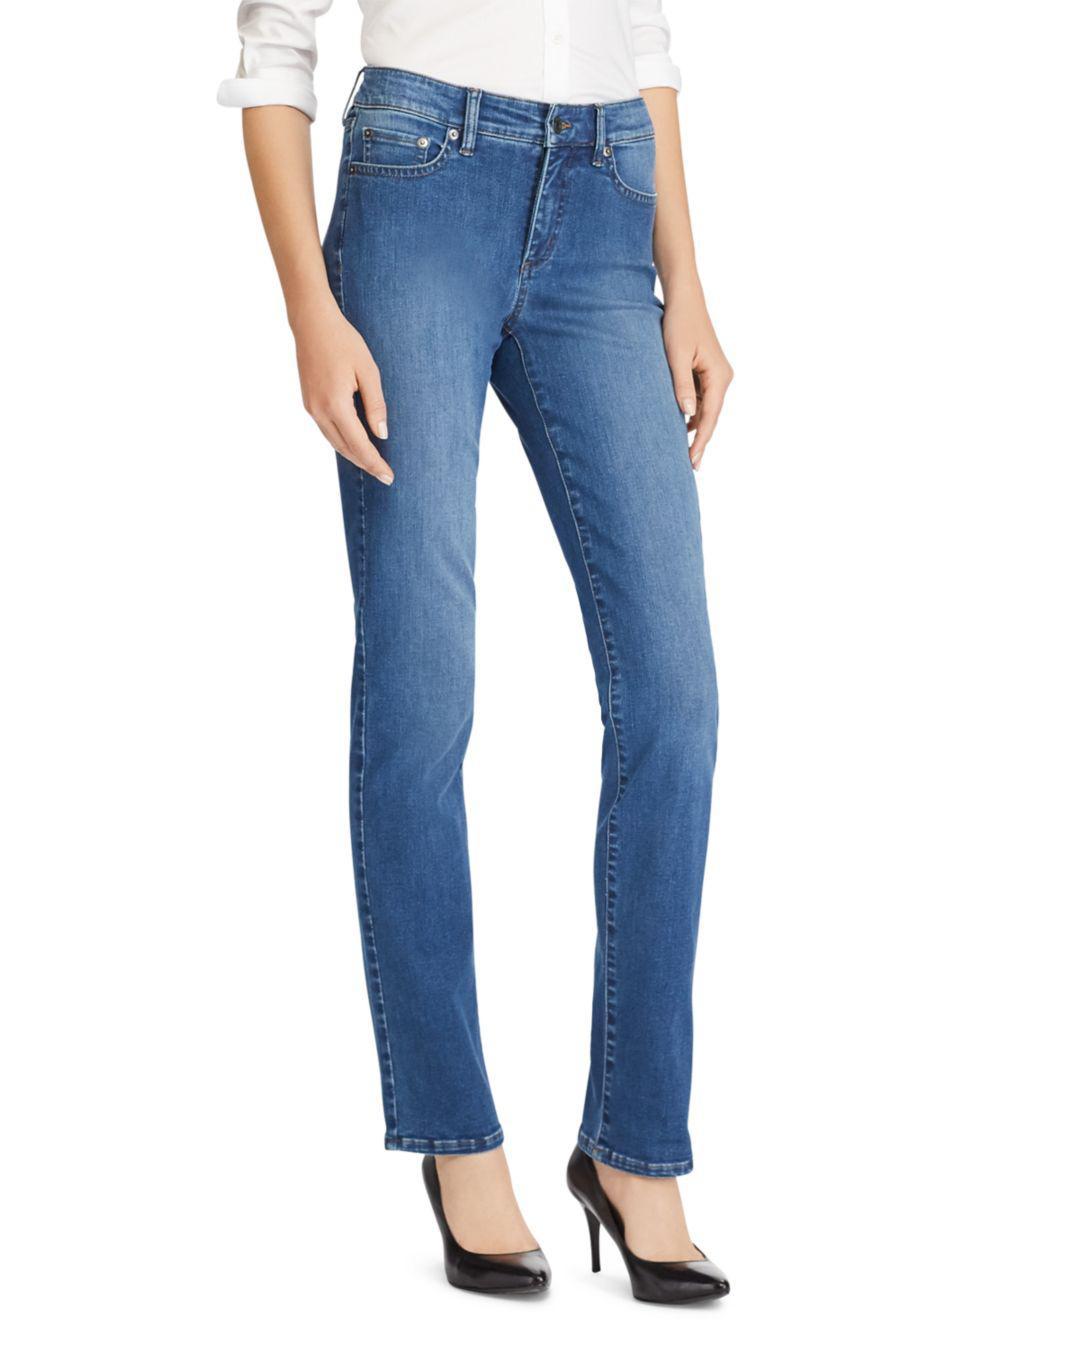 4b87ad8bebed4 Lyst - Ralph Lauren Premier Straight-leg Jeans In Harbor Wash in Blue